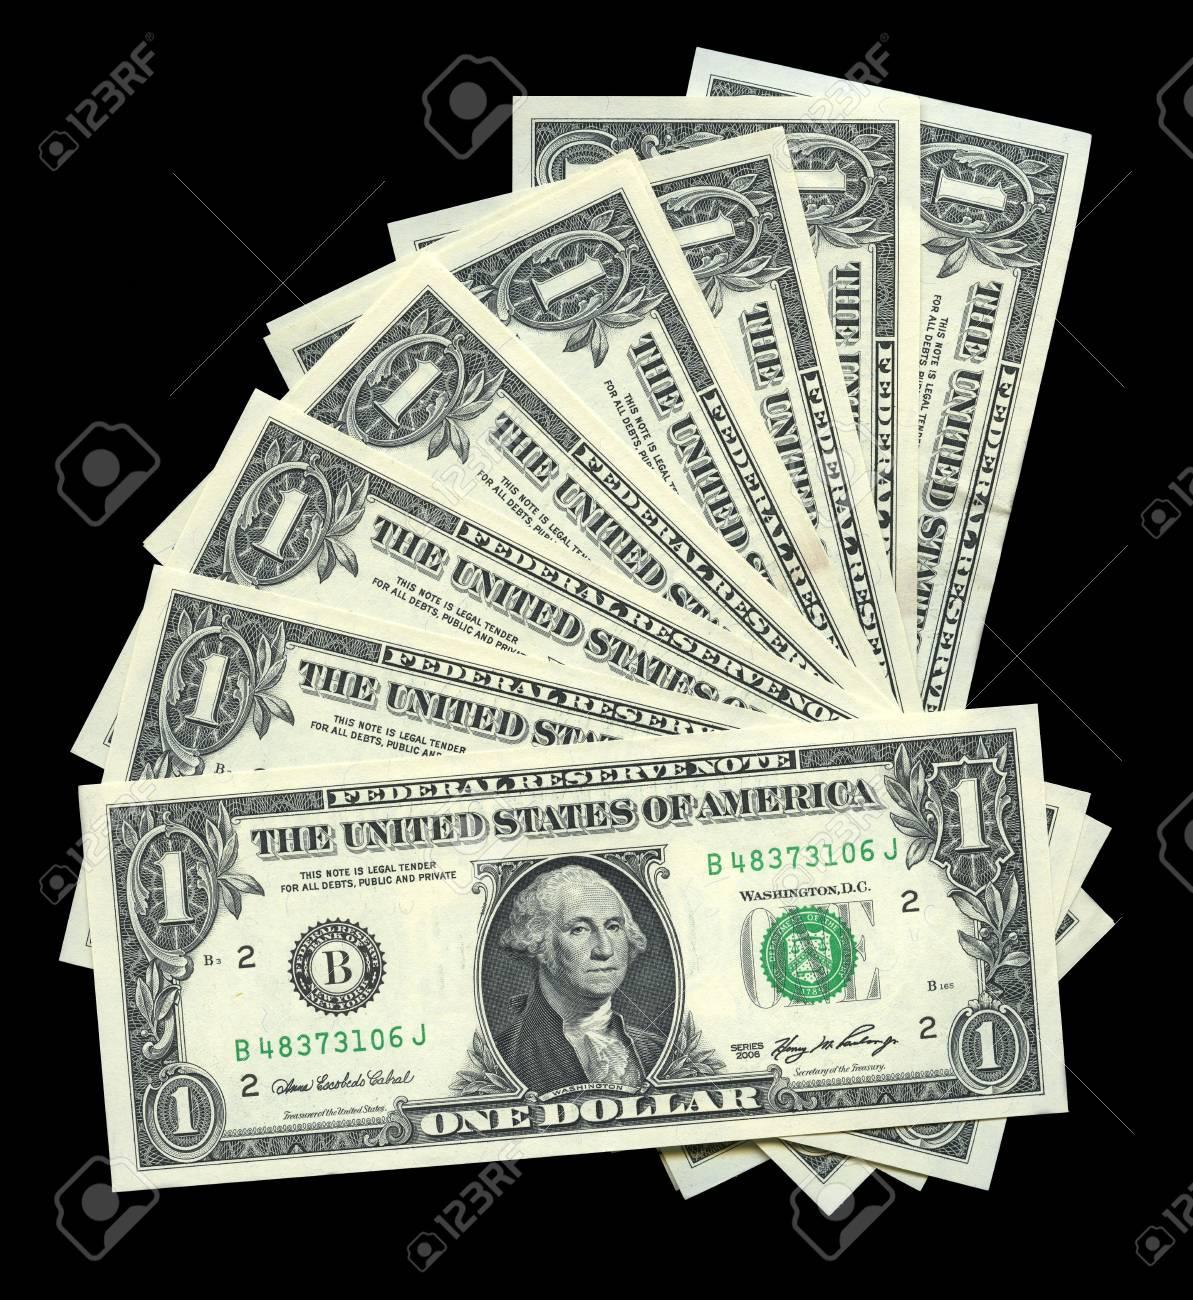 Photo of one dollar bill